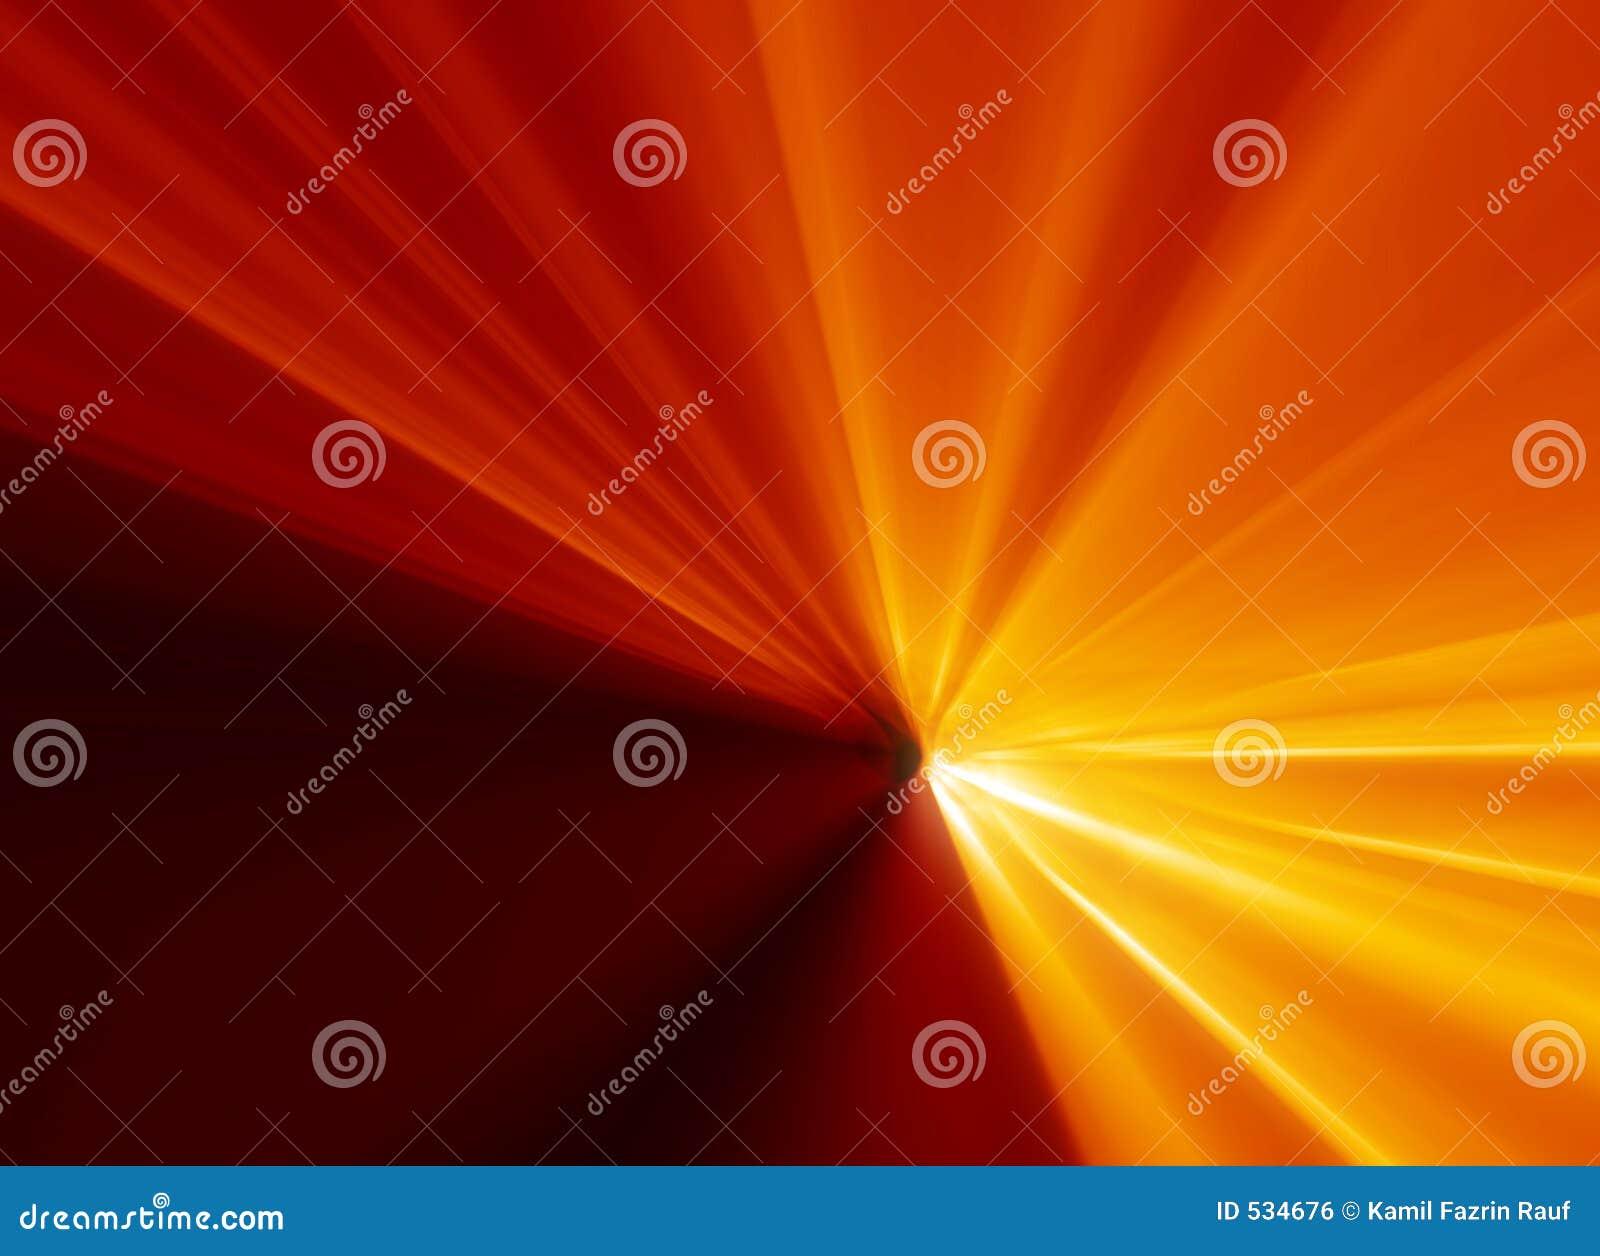 Download 4个作用光 库存例证. 插画 包括有 离子, 微粒, 大刀, 饱和, 对比, 作用, 照亮, 回报, 视觉, 能源 - 534676